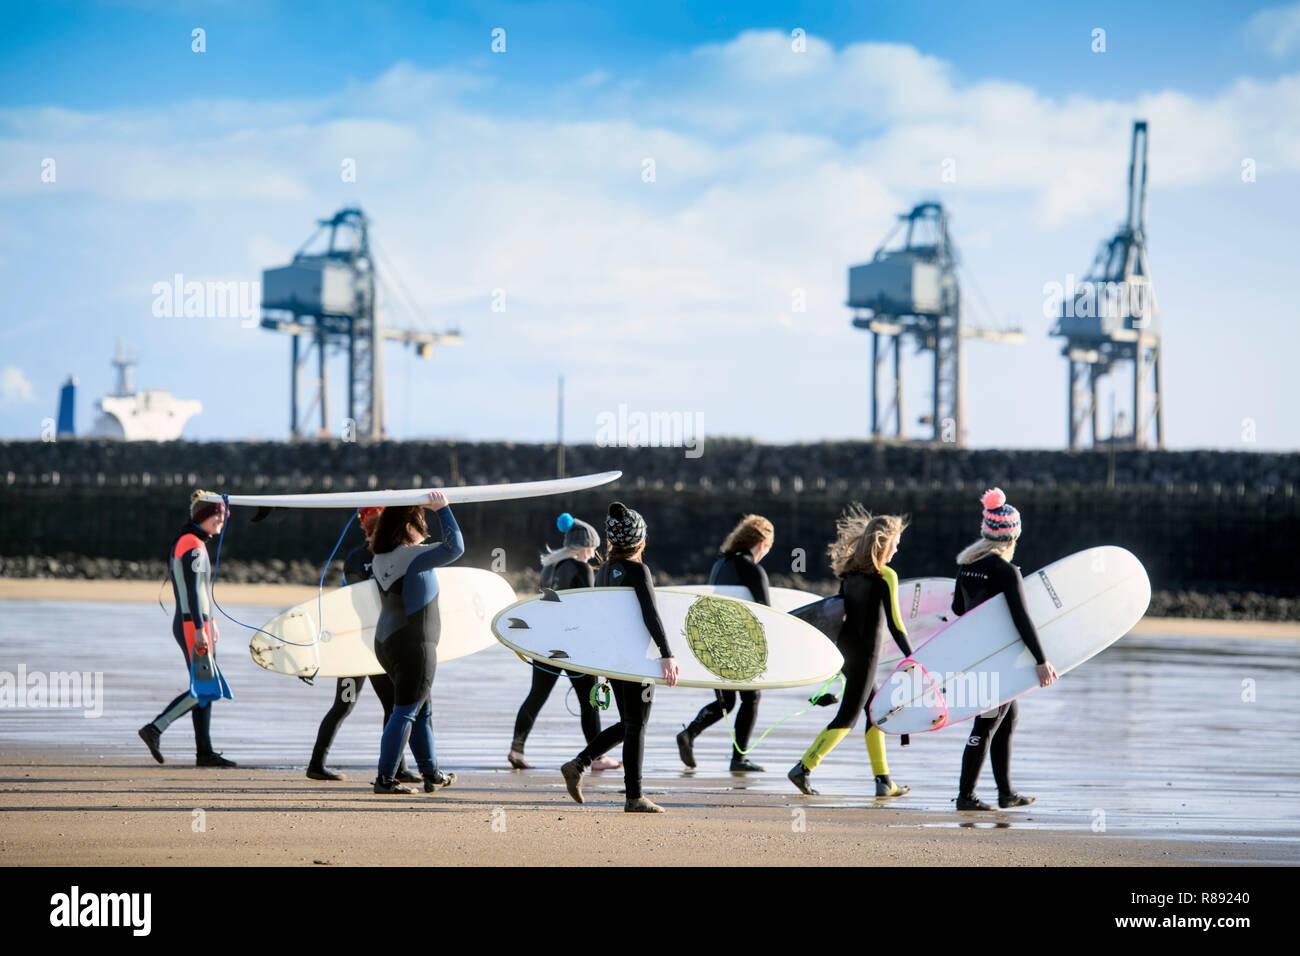 The women's surf community 'Surf Senioritas', members at Aberavon Beach near Port Talbot, S. Wales UK Stock Photo